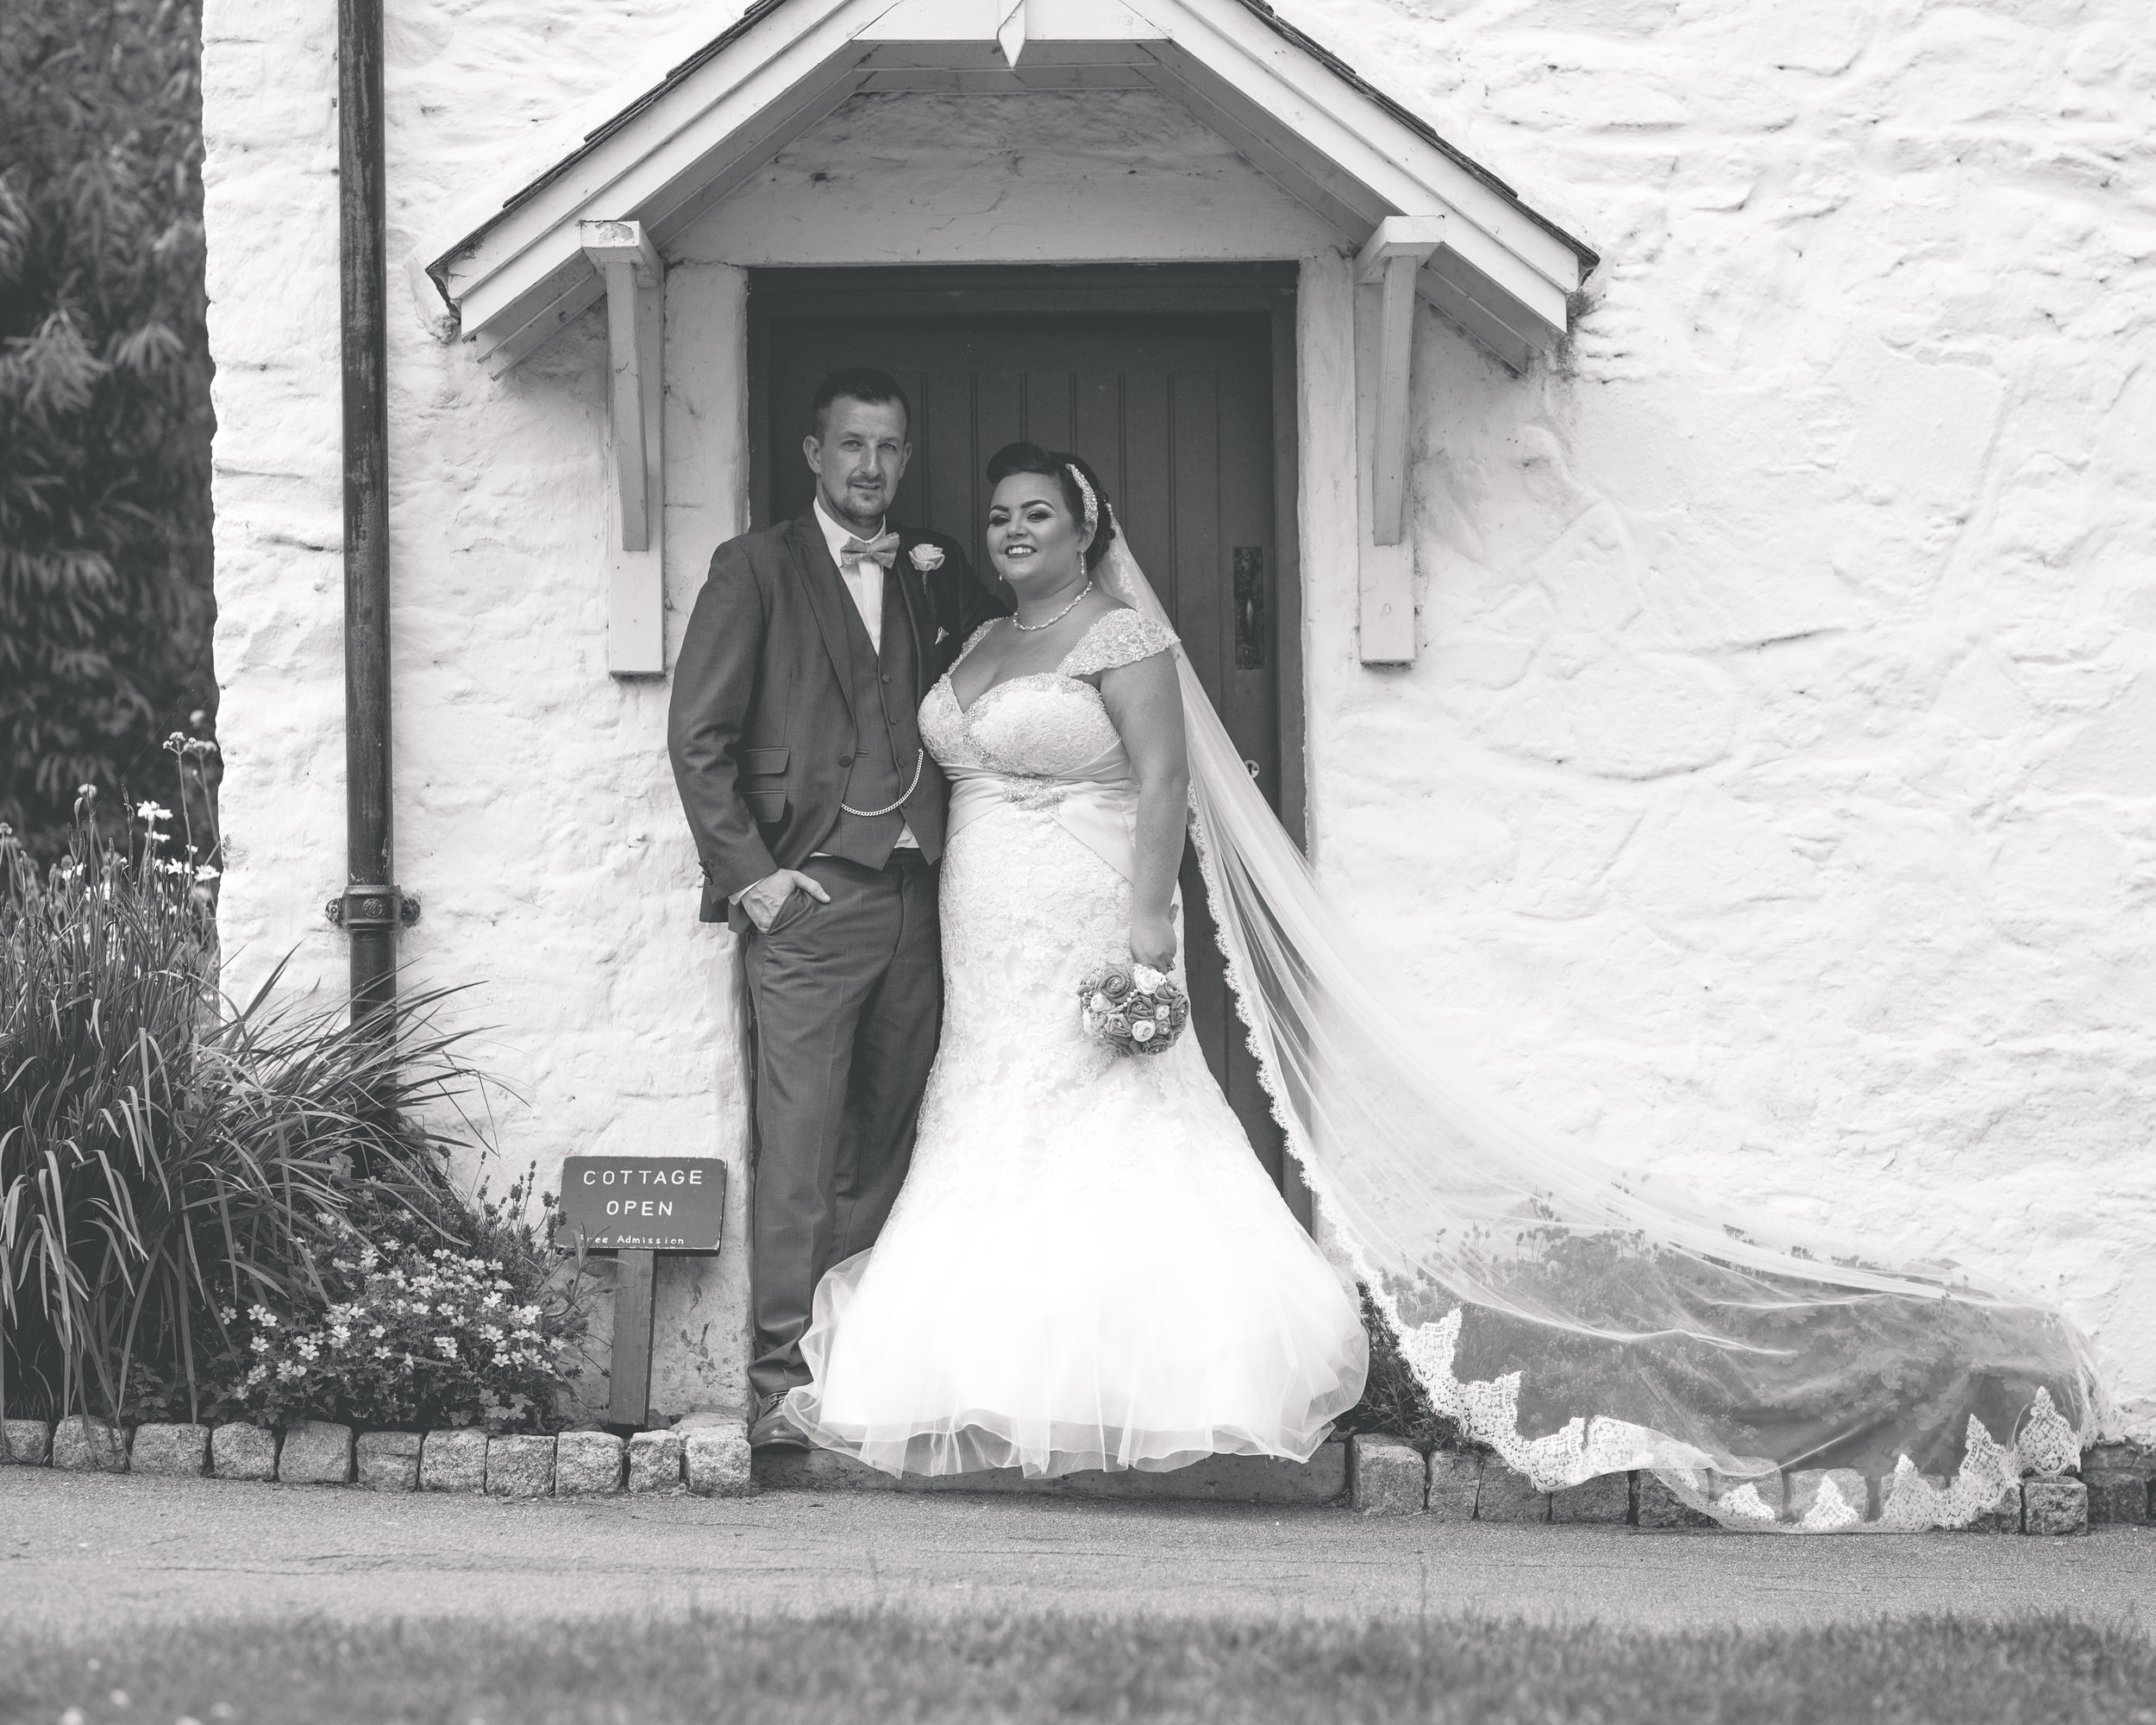 Antoinette & Stephen - Portraits   Brian McEwan Photography   Wedding Photographer Northern Ireland 4.jpg